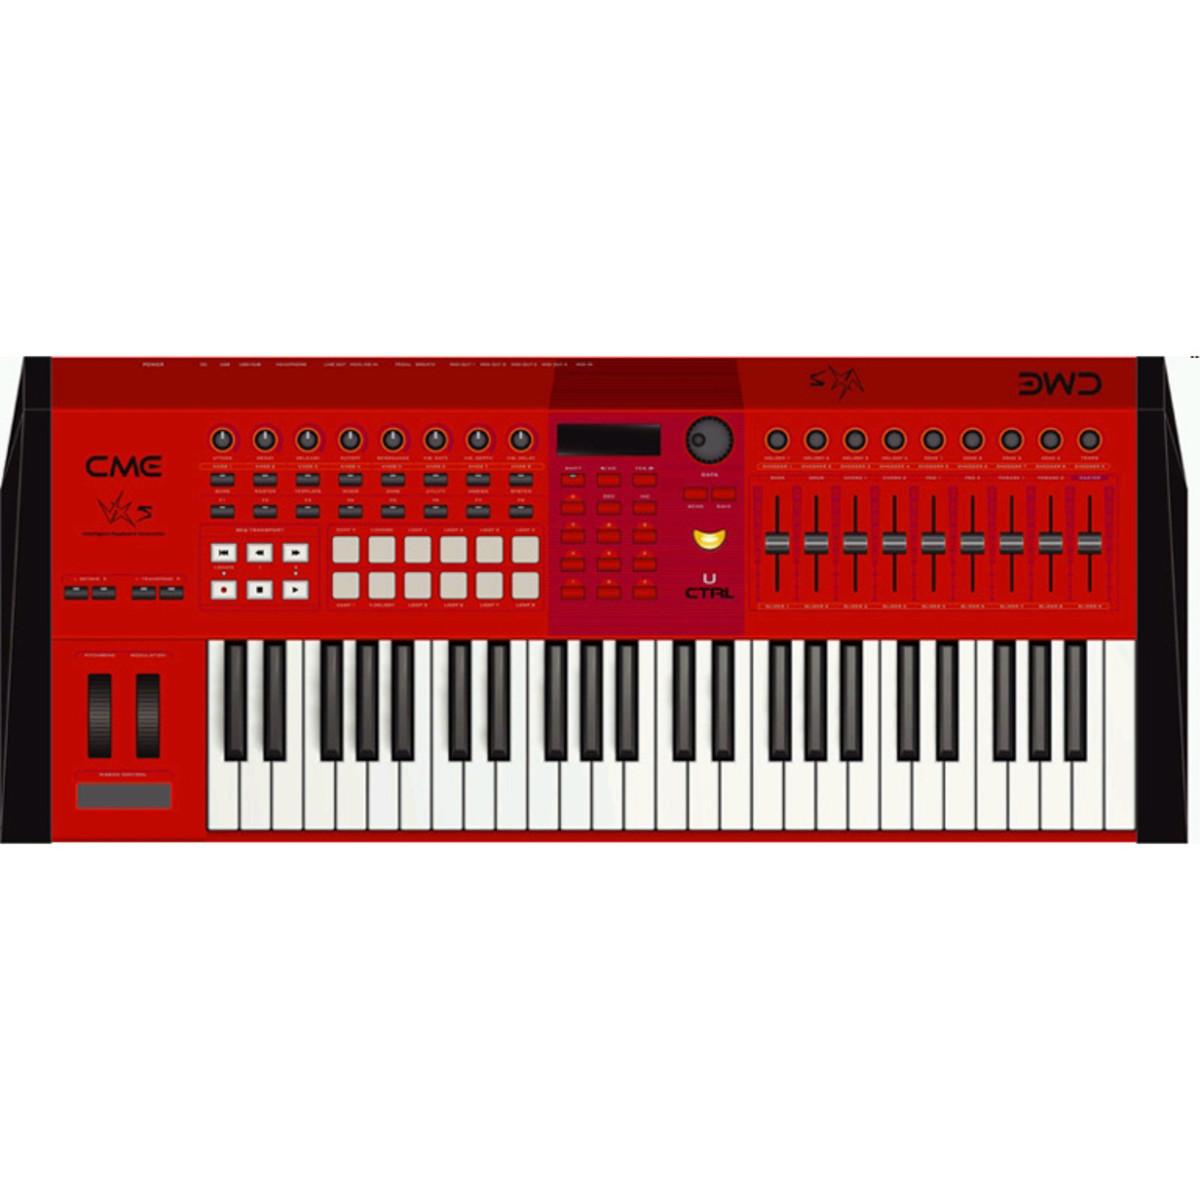 cme vx5 midi controller keyboard at. Black Bedroom Furniture Sets. Home Design Ideas